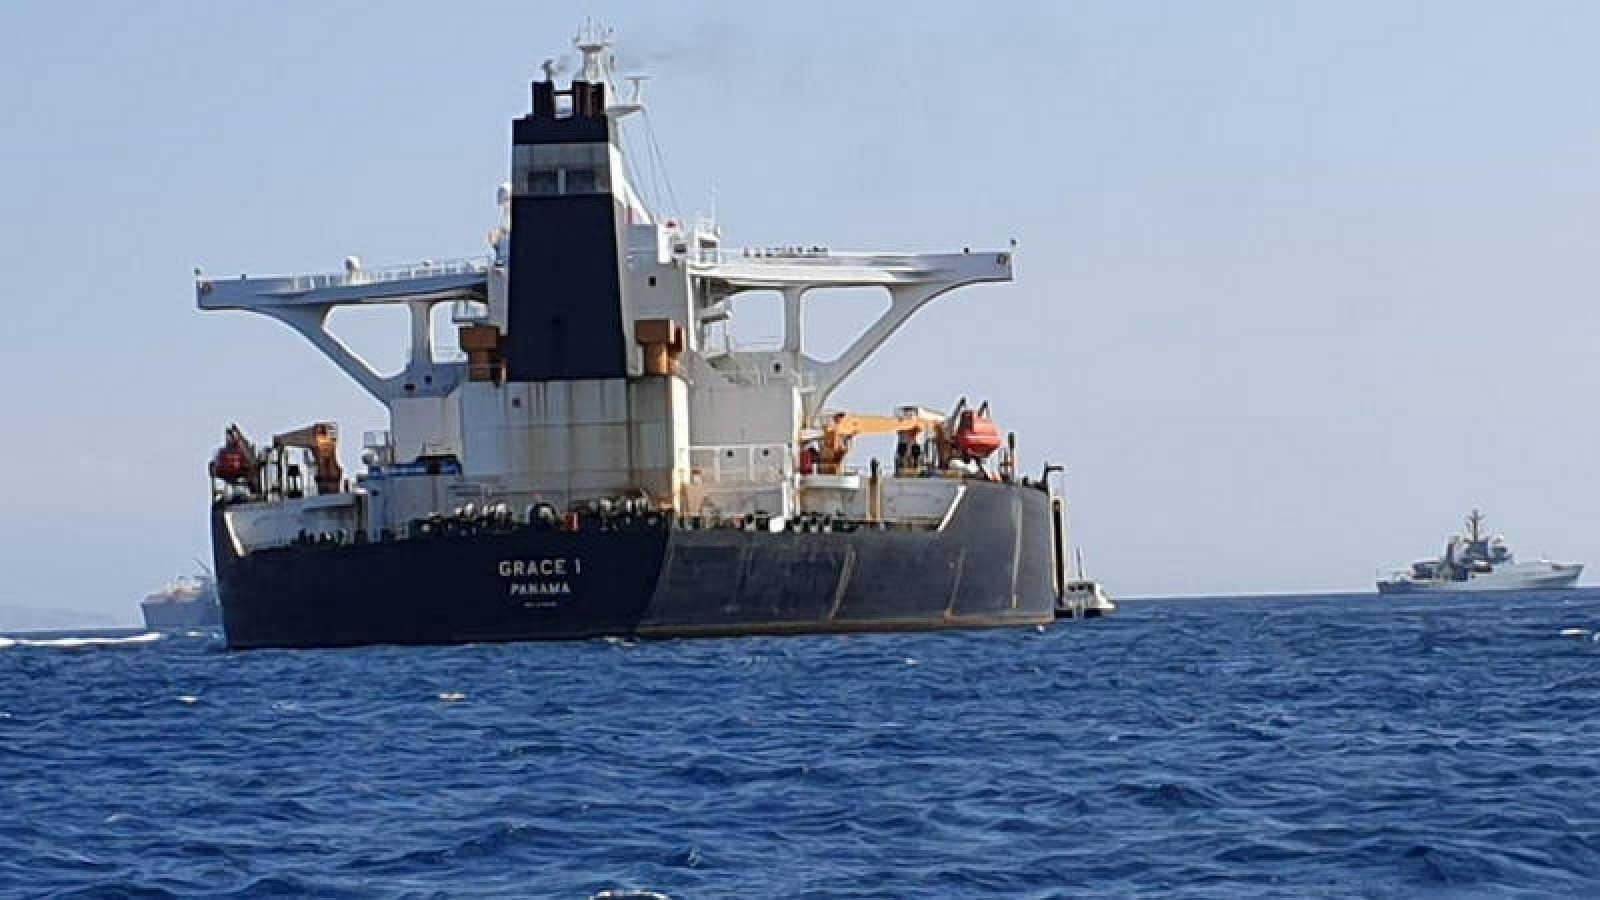 El superpetrolero iraní 'Grace 1', atracado cerca de Gibraltar